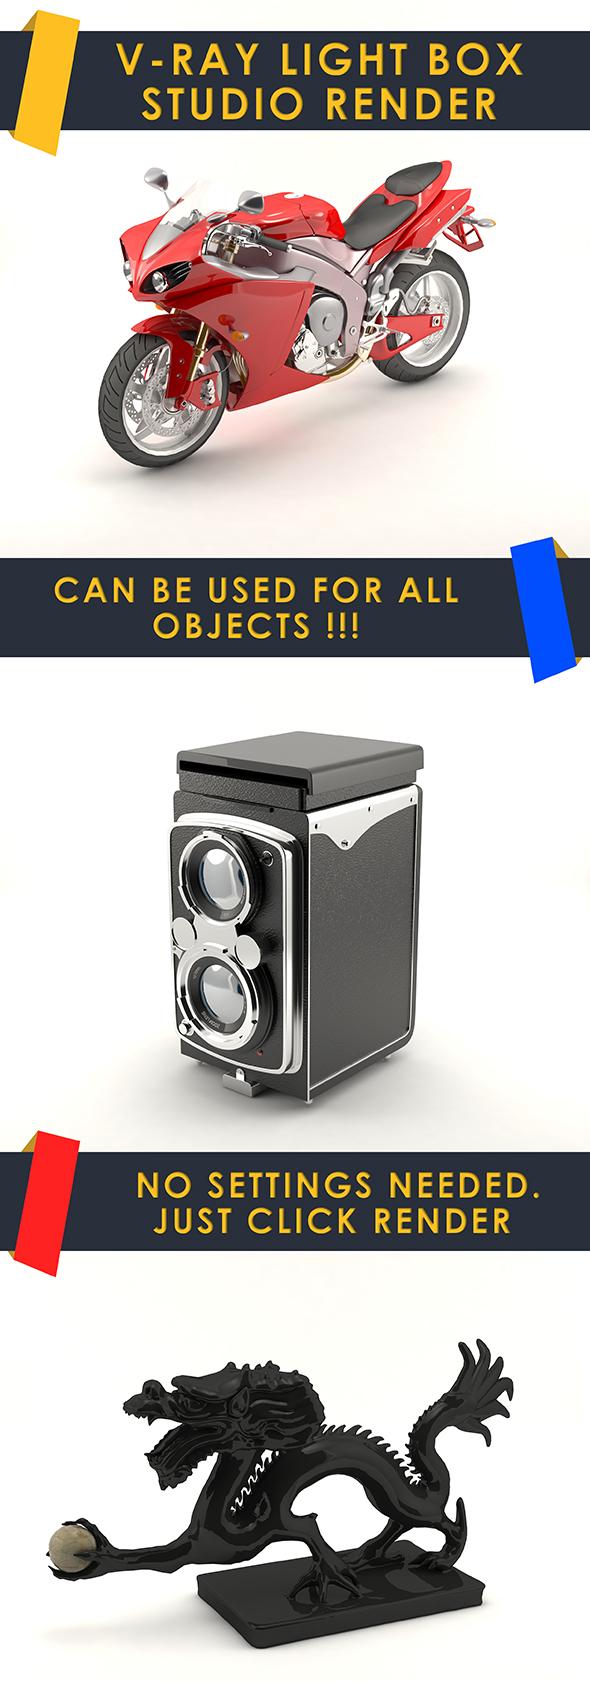 Vray light box studio render scene - 3DOcean Item for Sale